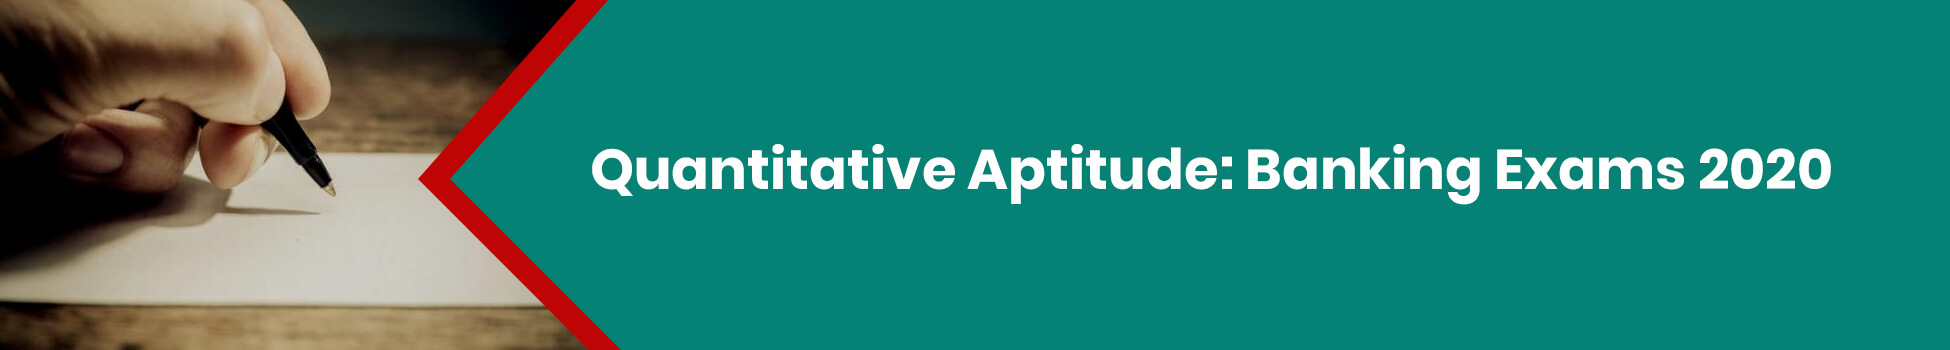 Quantitative Aptitude: Banking Exams 2020